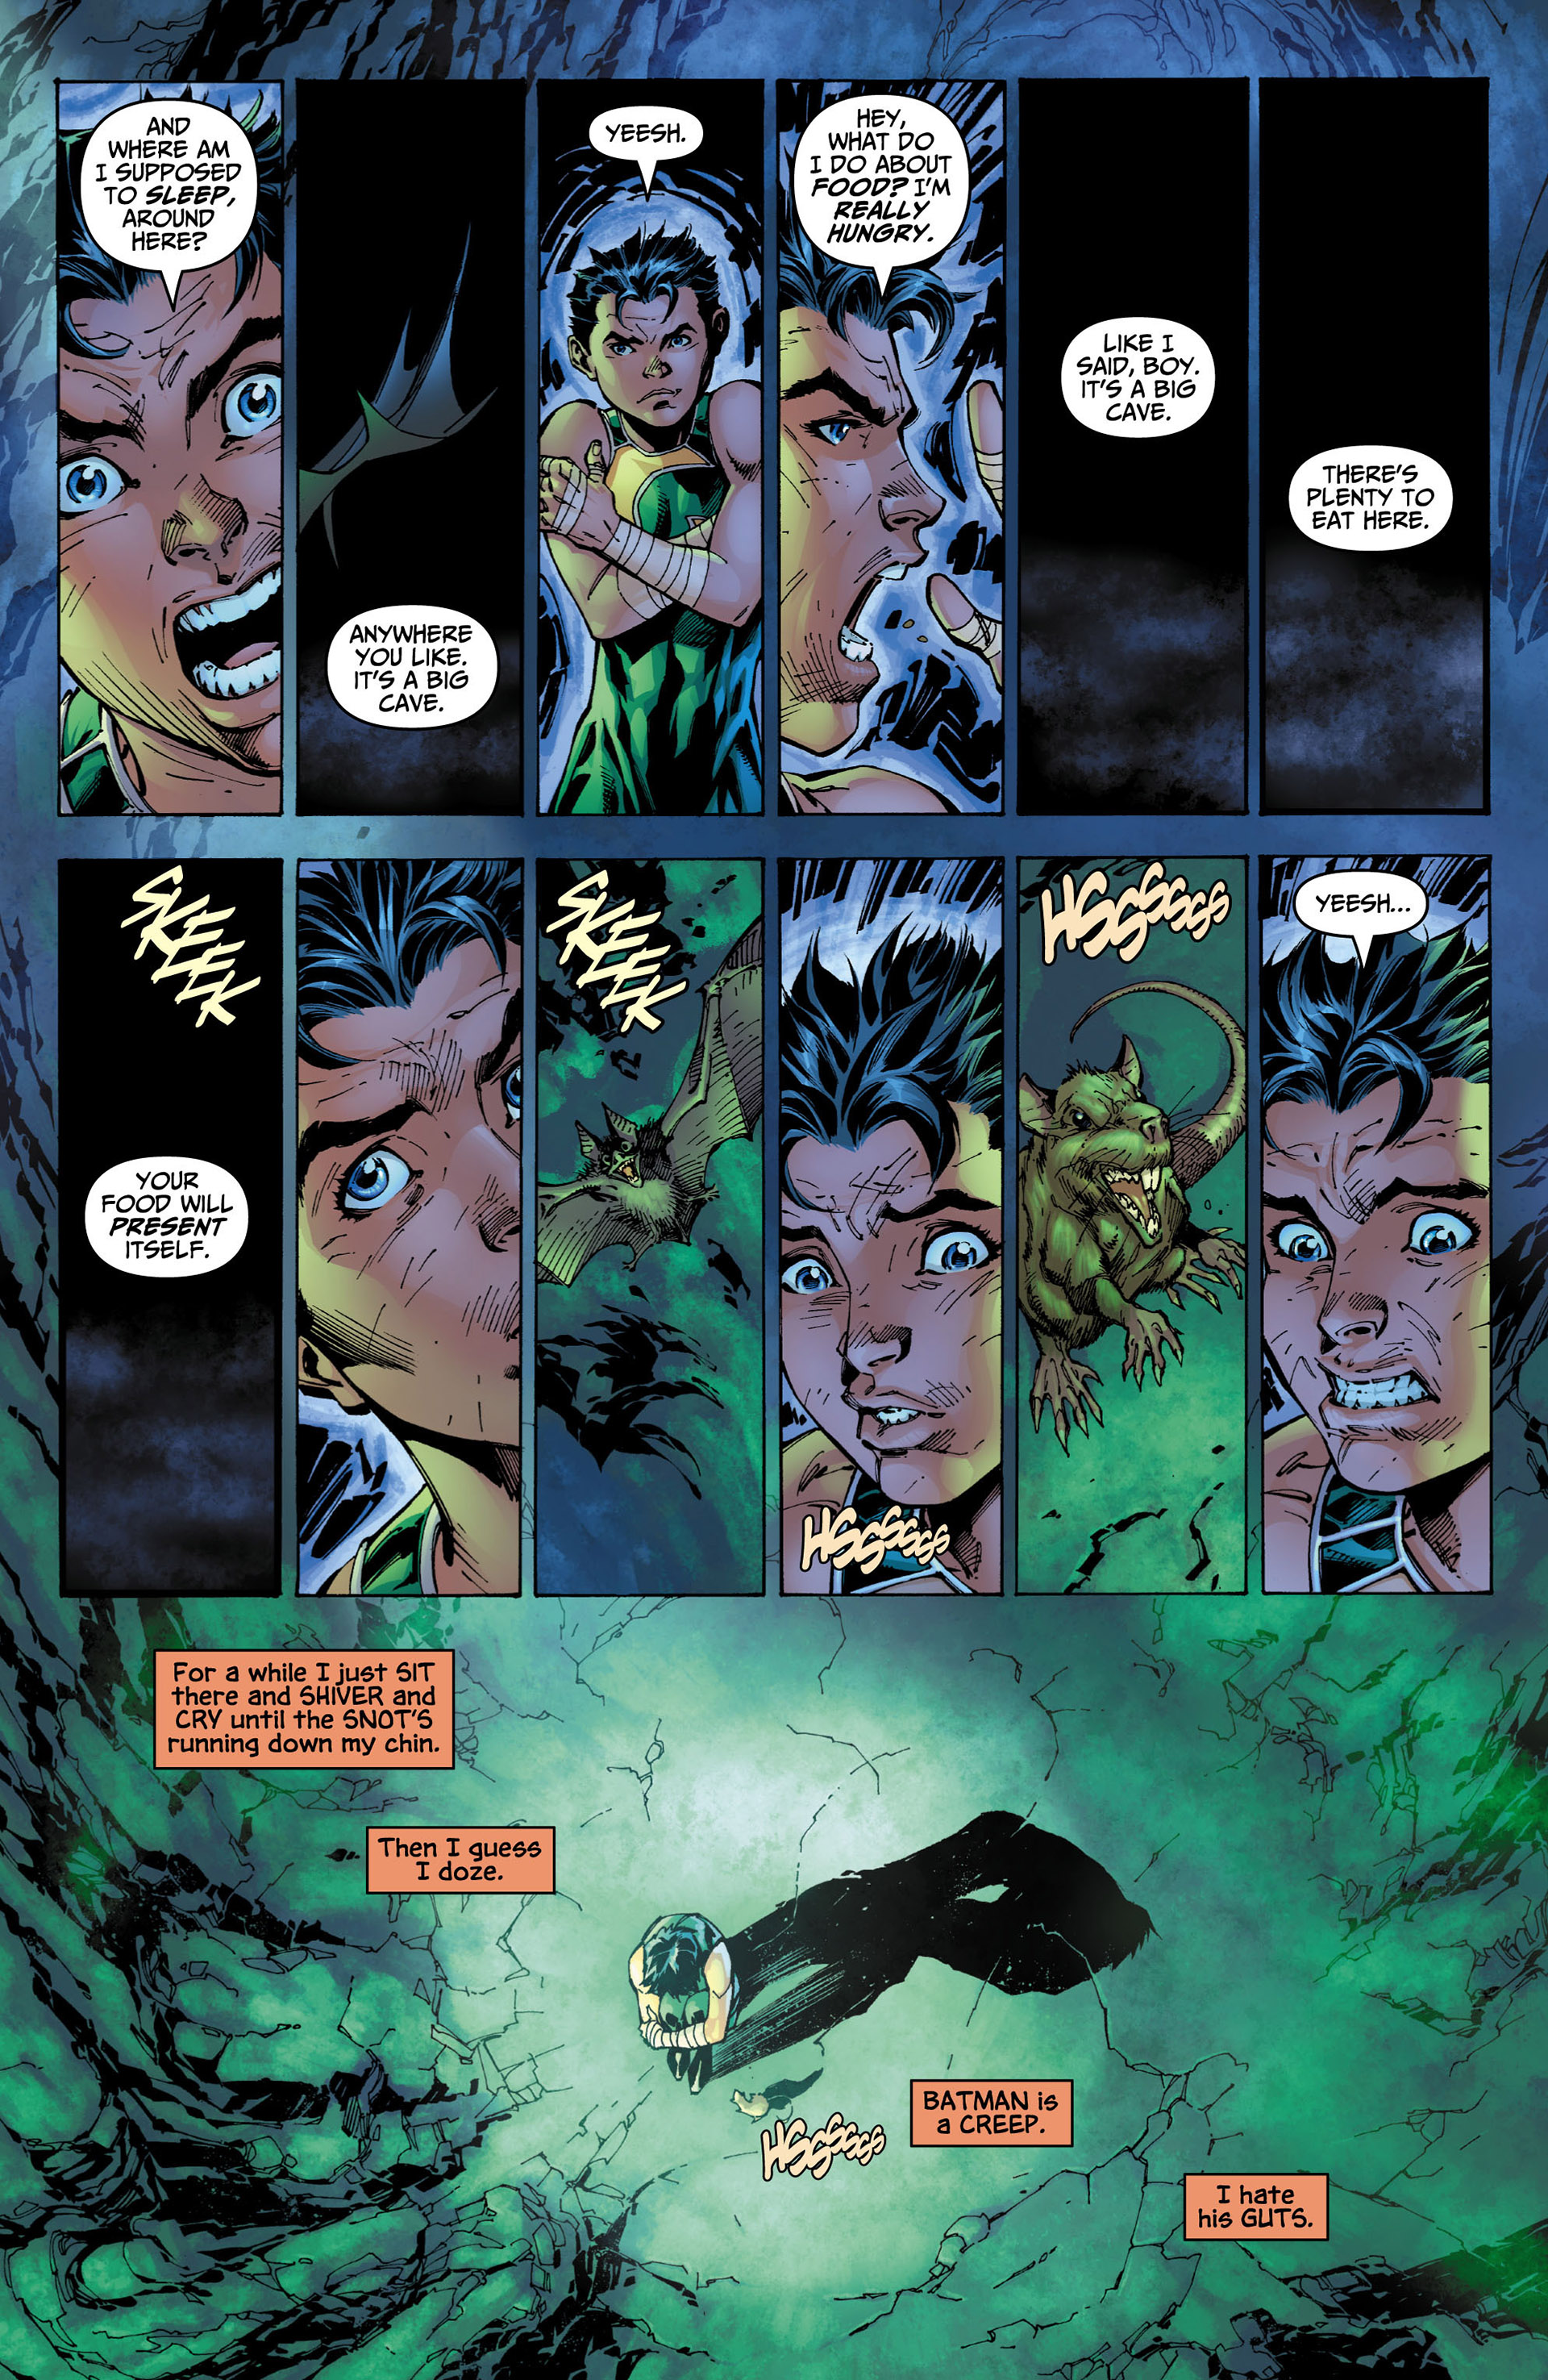 Read online All Star Batman & Robin, The Boy Wonder comic -  Issue #4 - 19